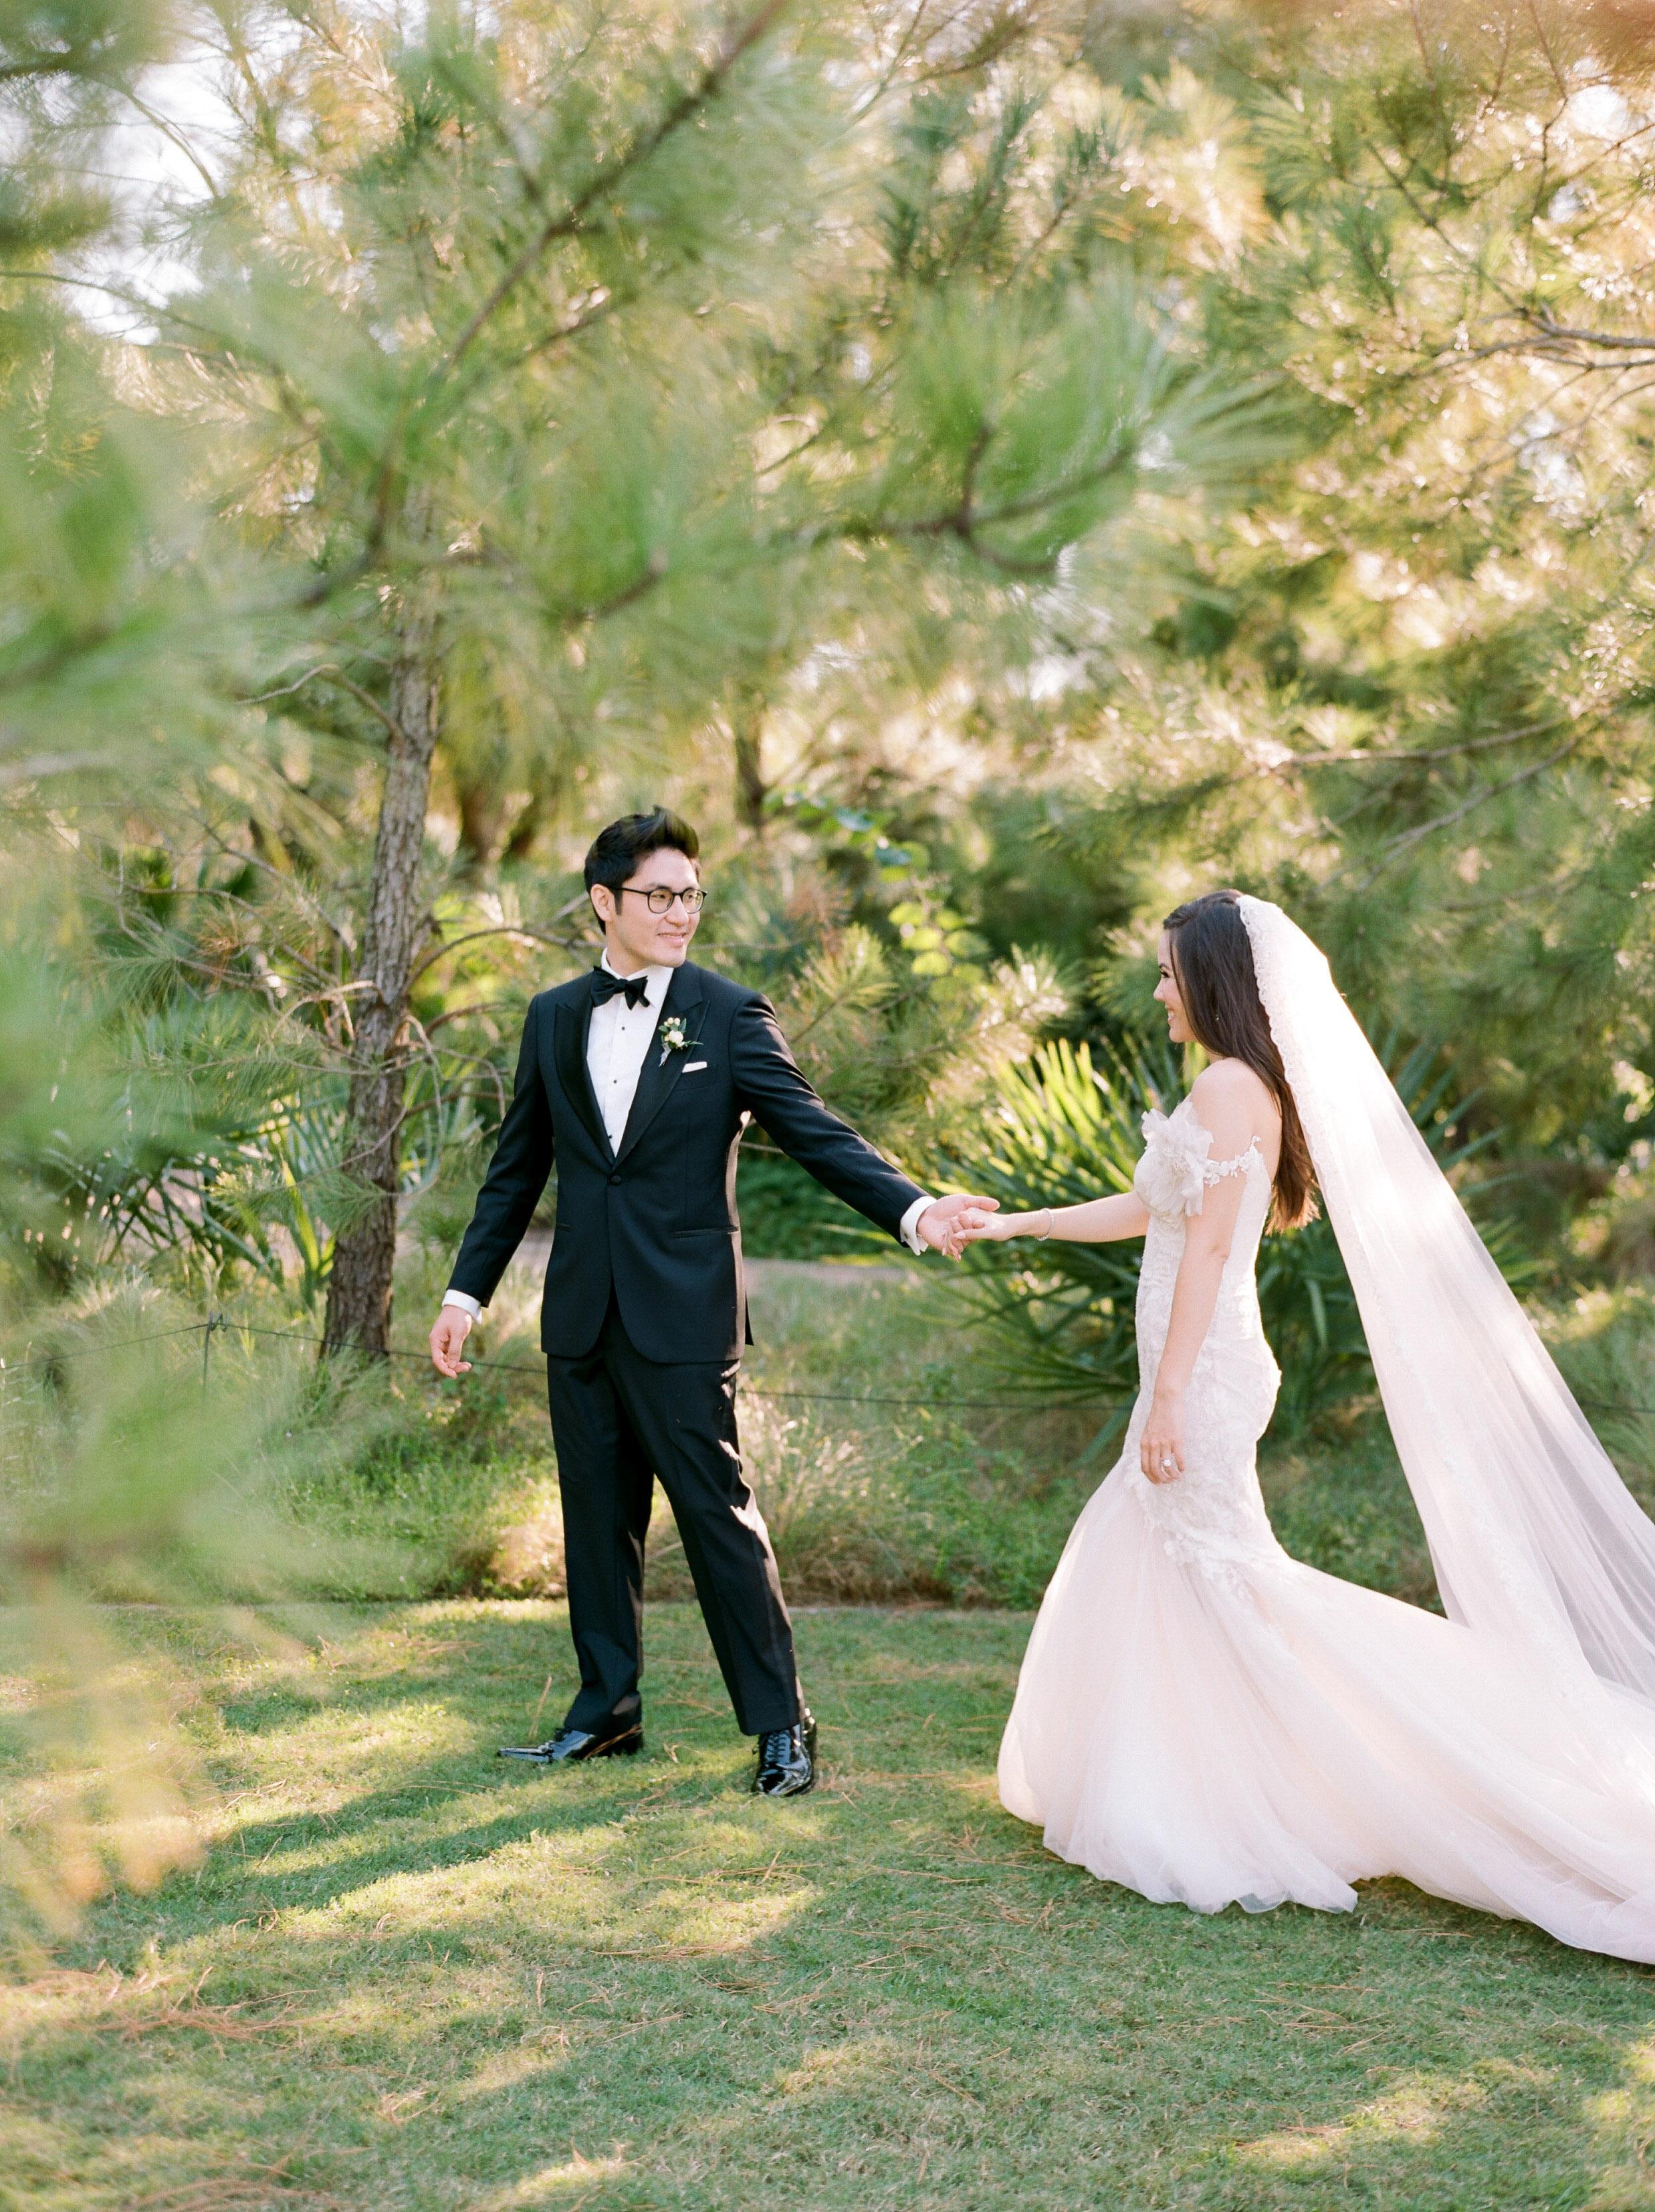 Martha-Stewart-Wedding-Dana-Fernandez-Photography-Josh-Texas-Film-Houston-Wedding-Fine-Art-Photographer-McGovern-Centennial-Gardens-Top-Best-42.jpg